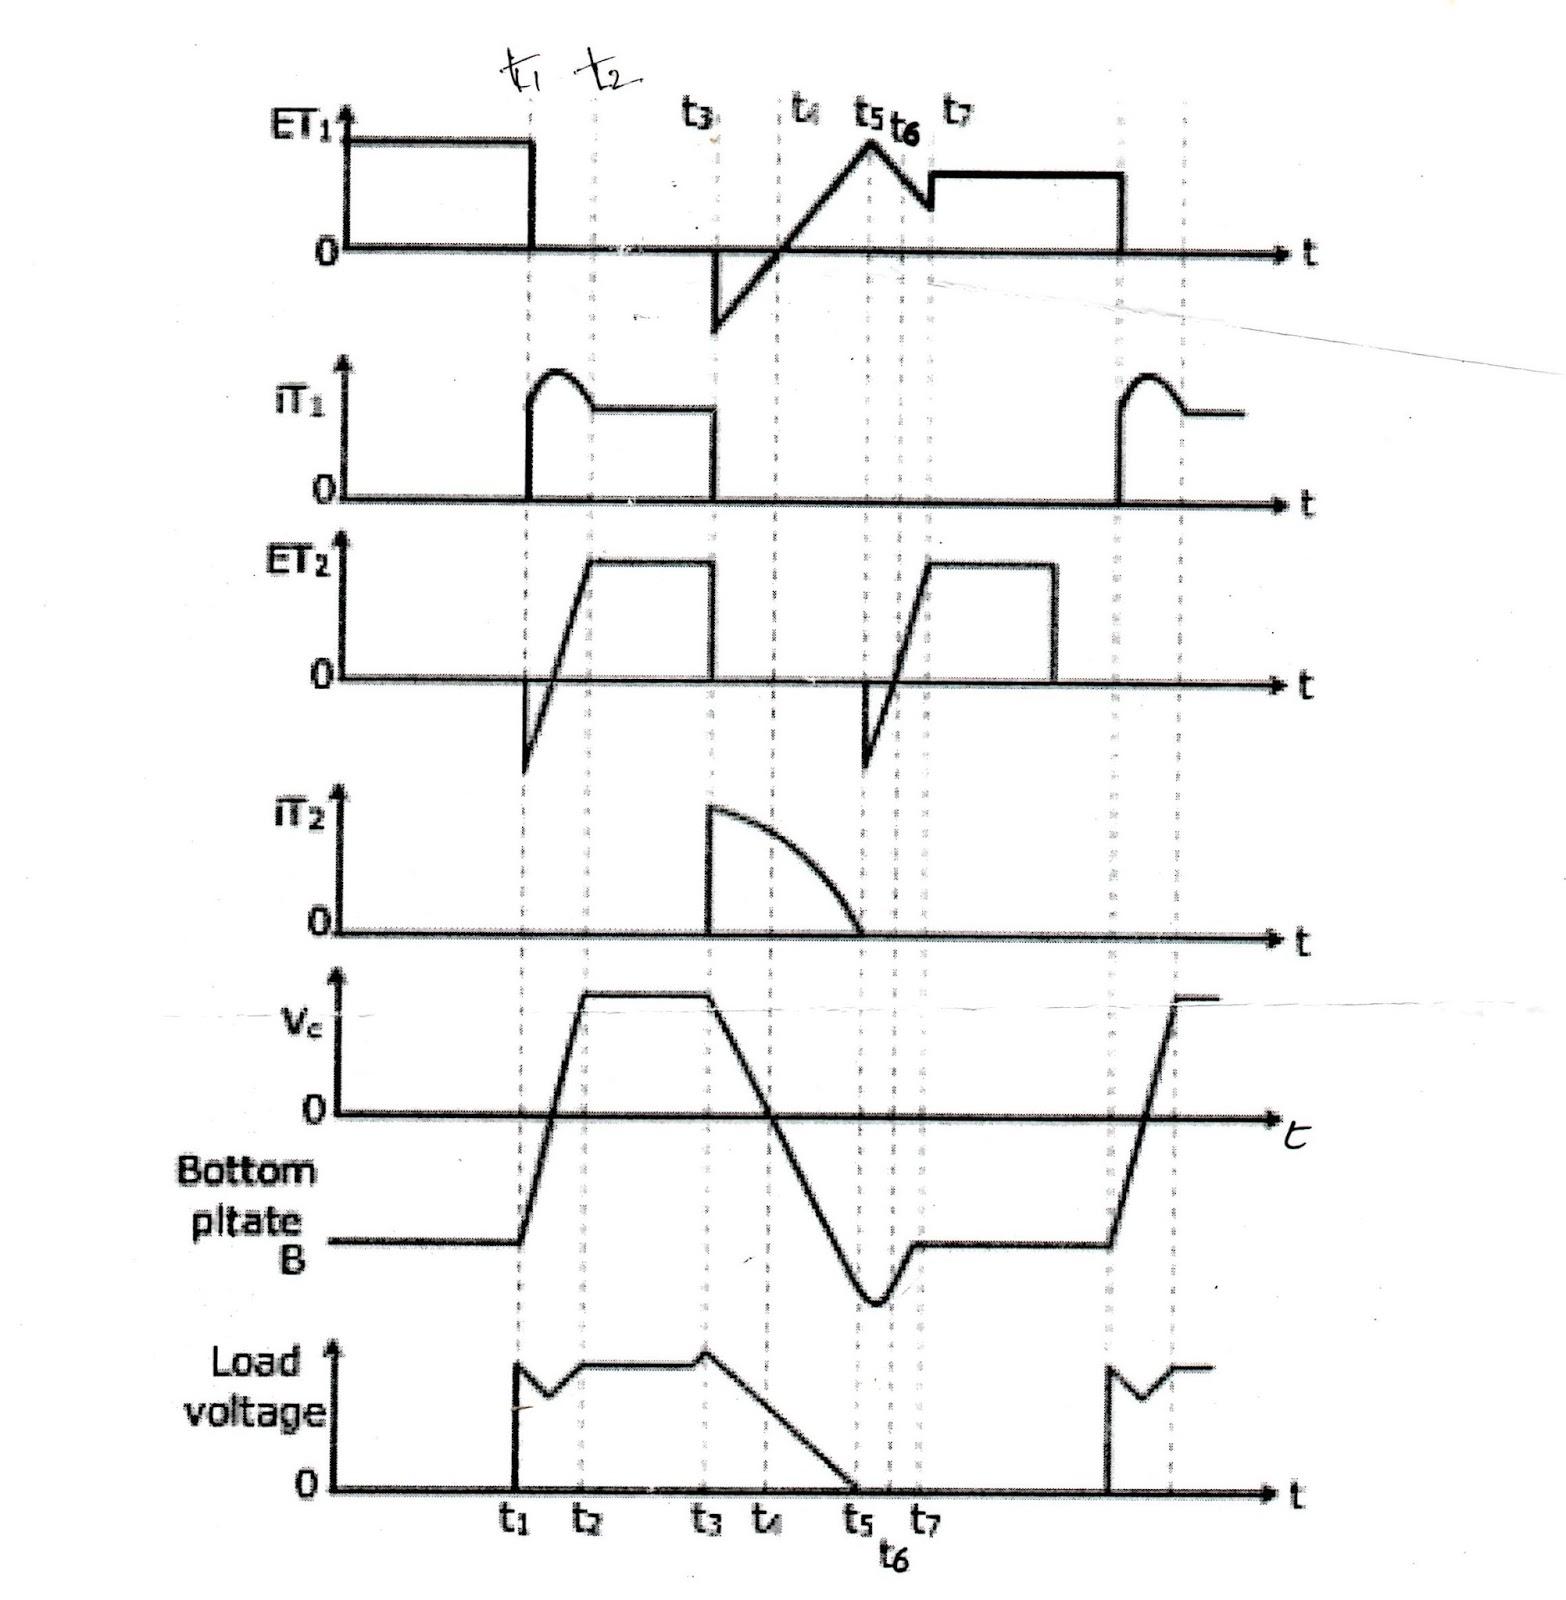 hight resolution of engineering notes jones chopper engineering notes deep fryer diagram circuit diagram jones chopper